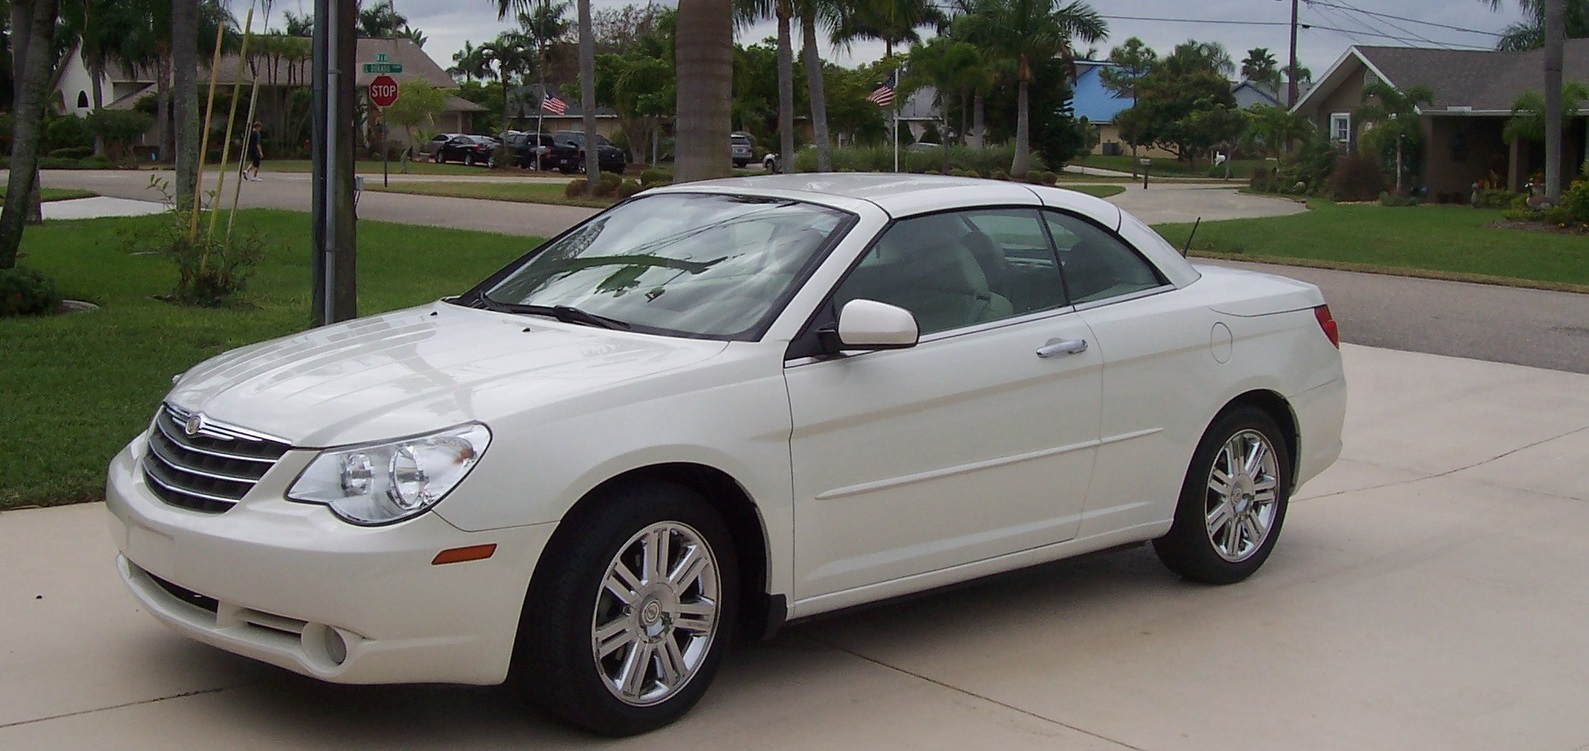 Brakes Plus Near Me >> 2006 CHRYSLER SEBRING TOURING LIMITED EDITION - Best OC Cars | Orange County Best Cars | Car Dealer